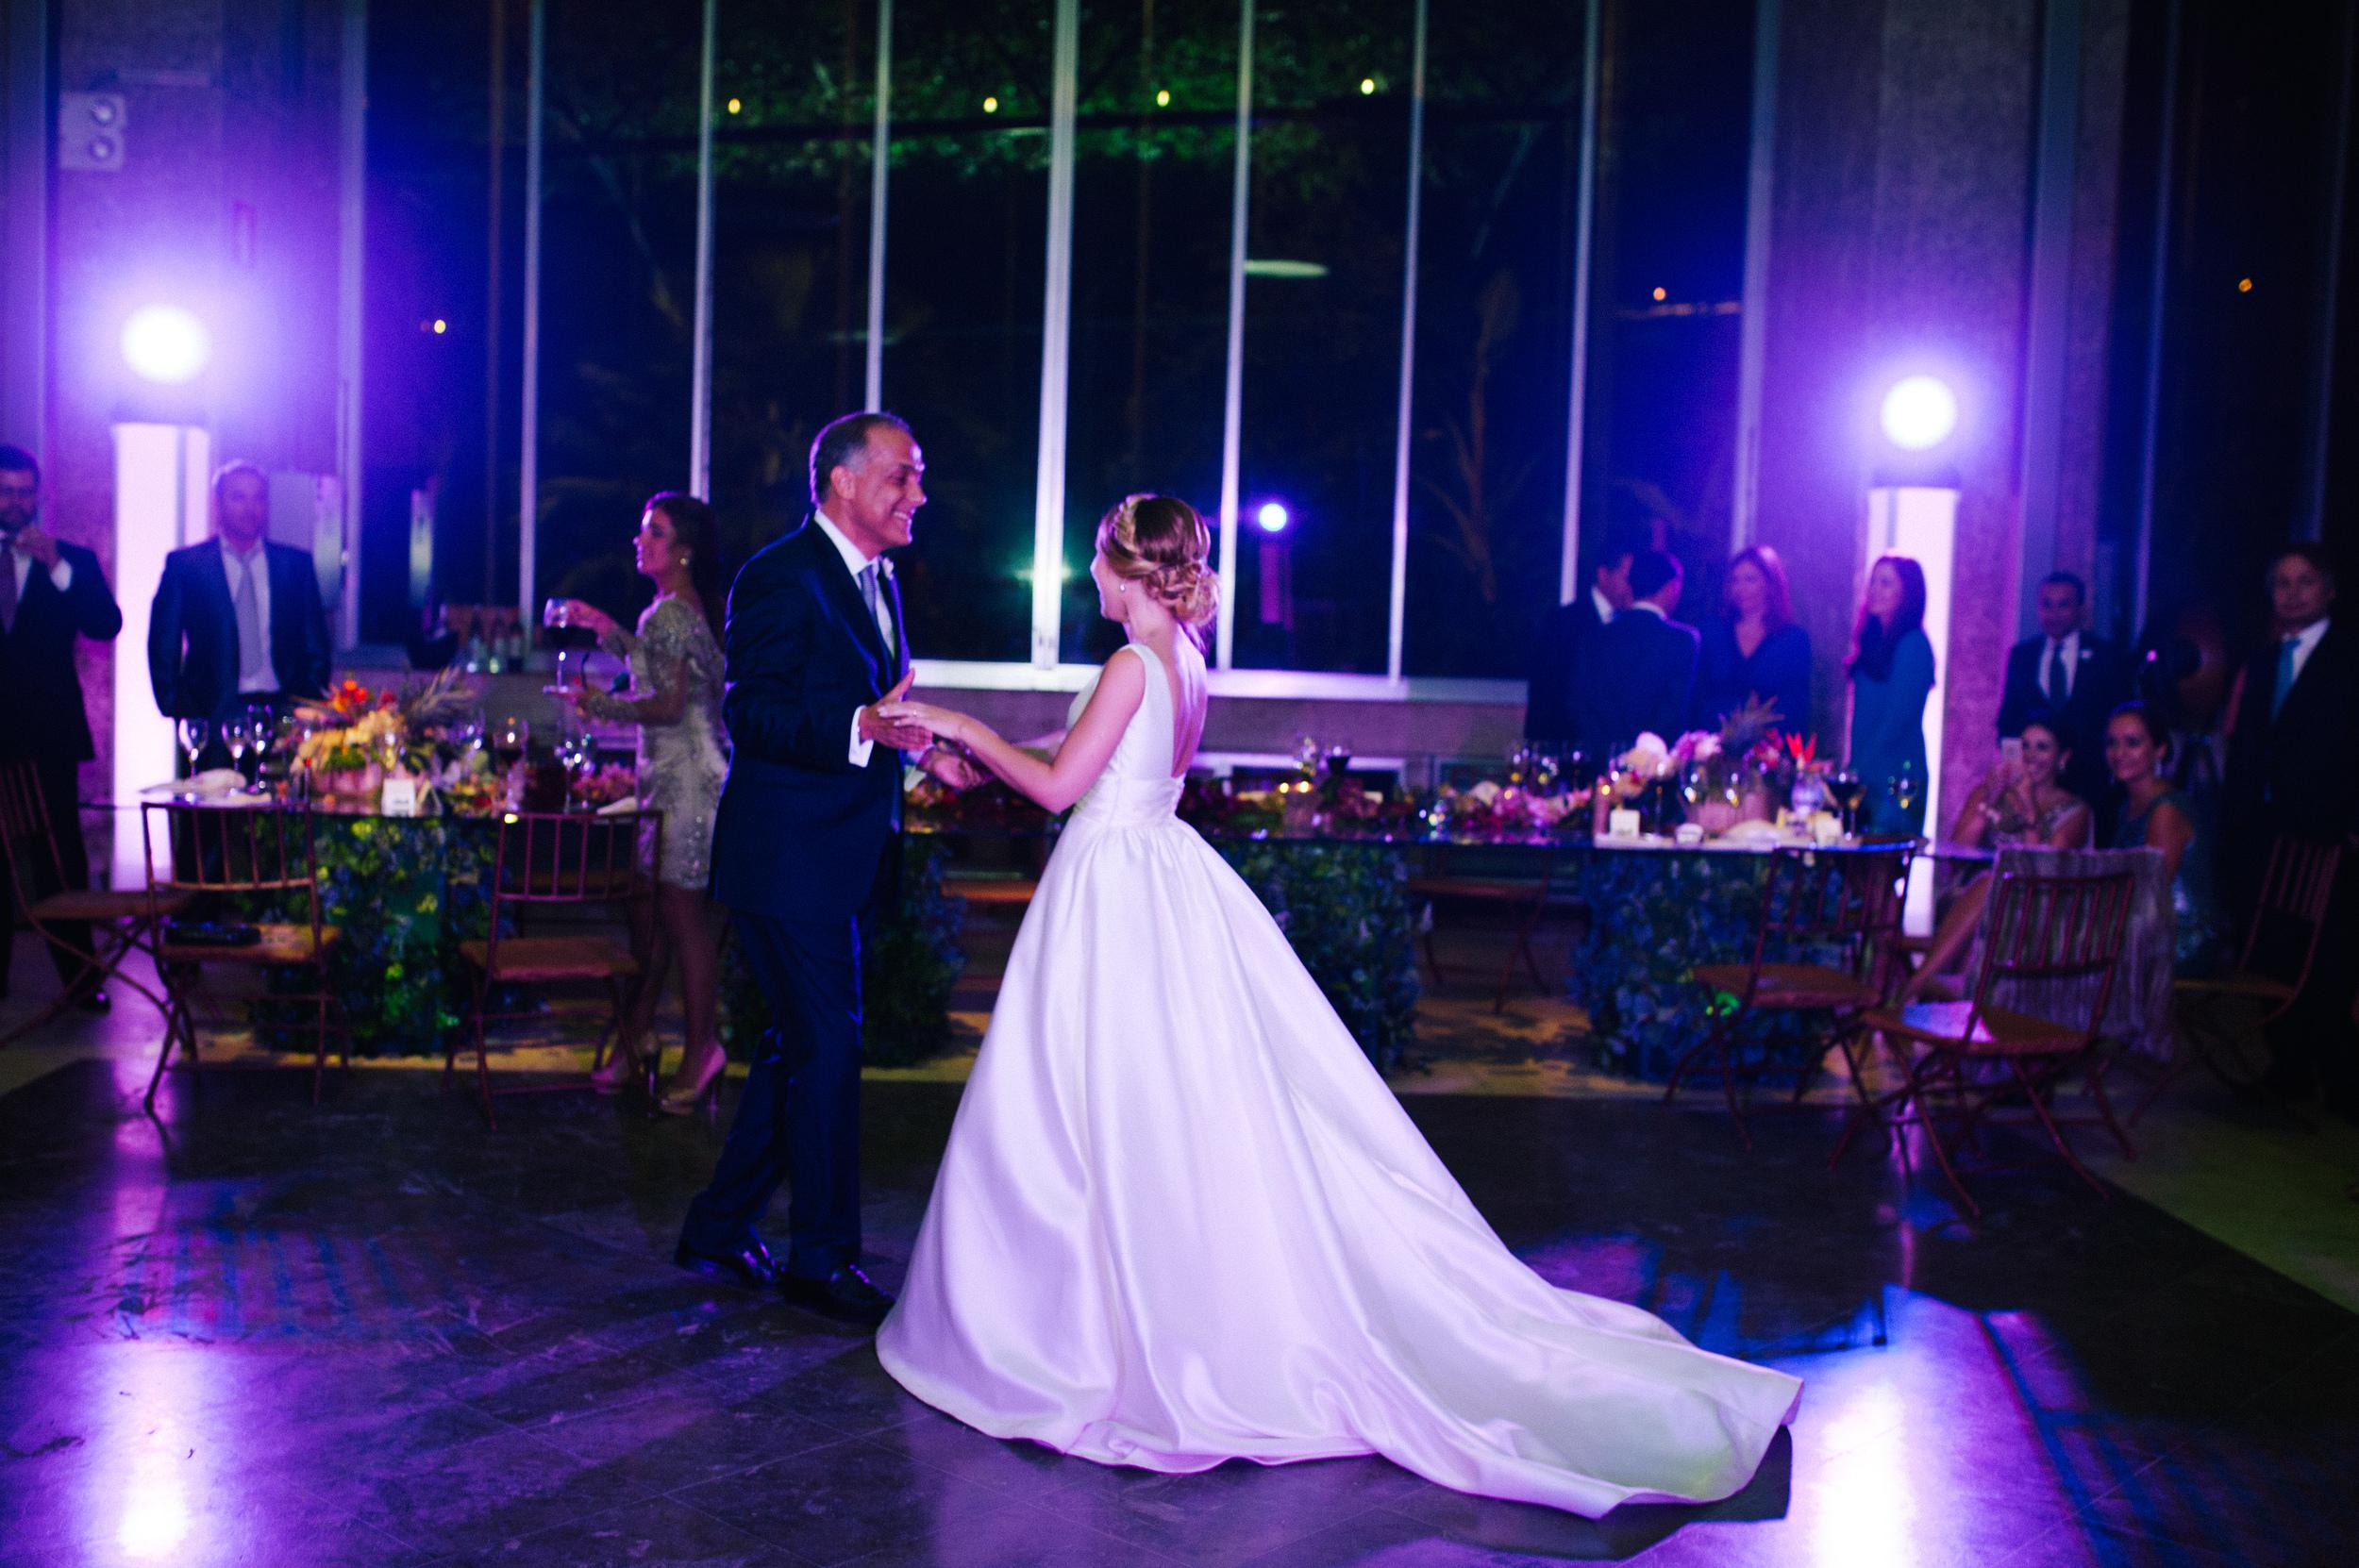 mariarao+wedding+estufa+fria-546.jpg